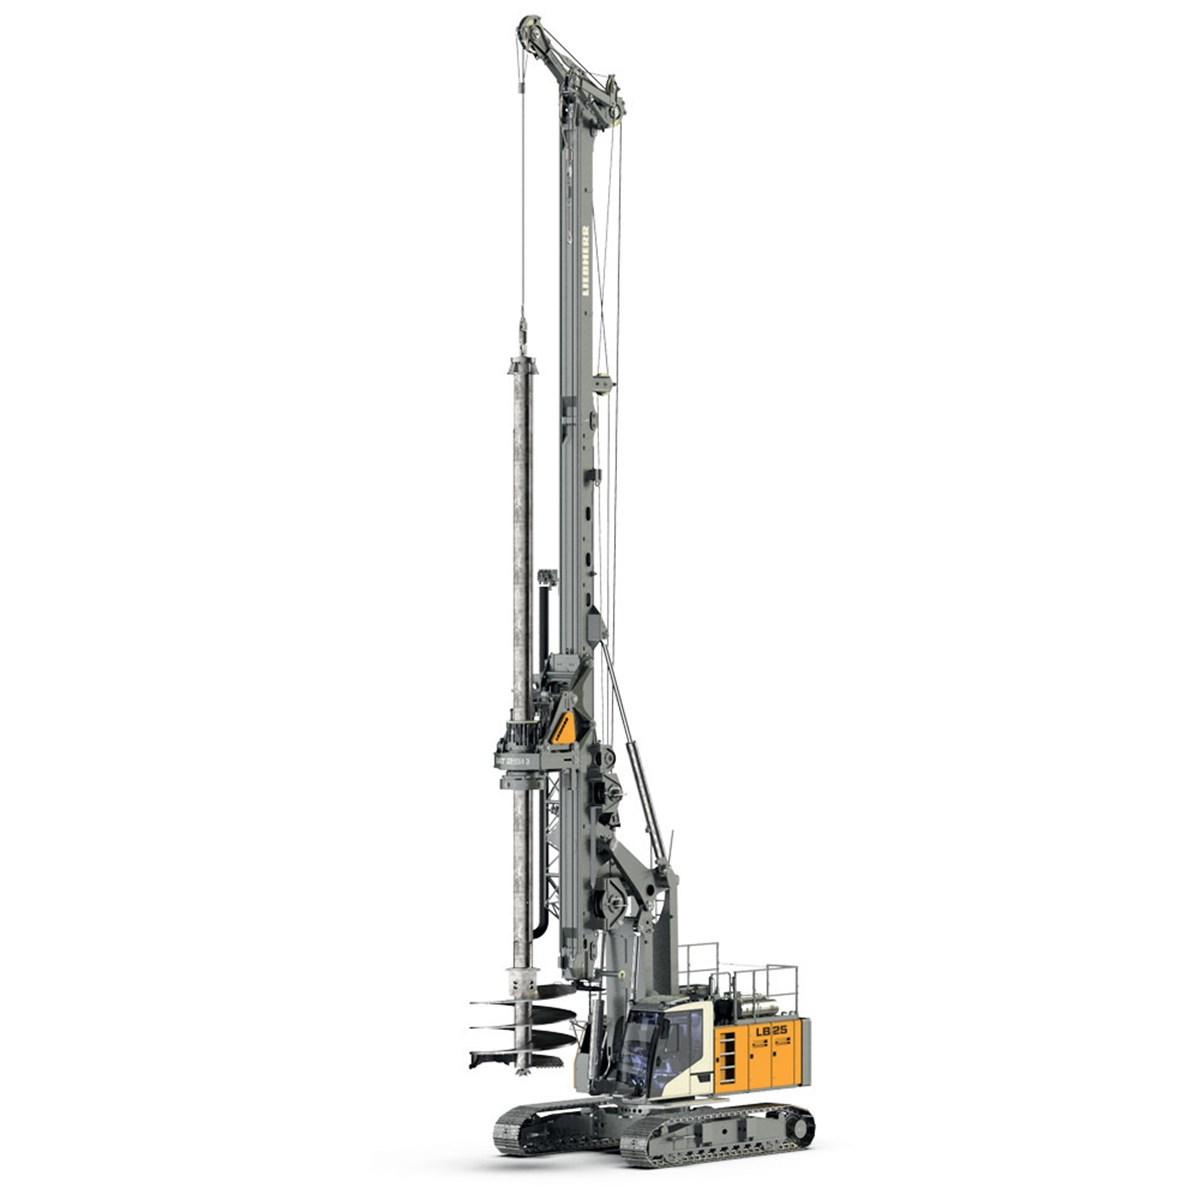 liebherr-lb-25-drehbohrgeraet-drilling-rig-kelly-kellybohren-1.jpg